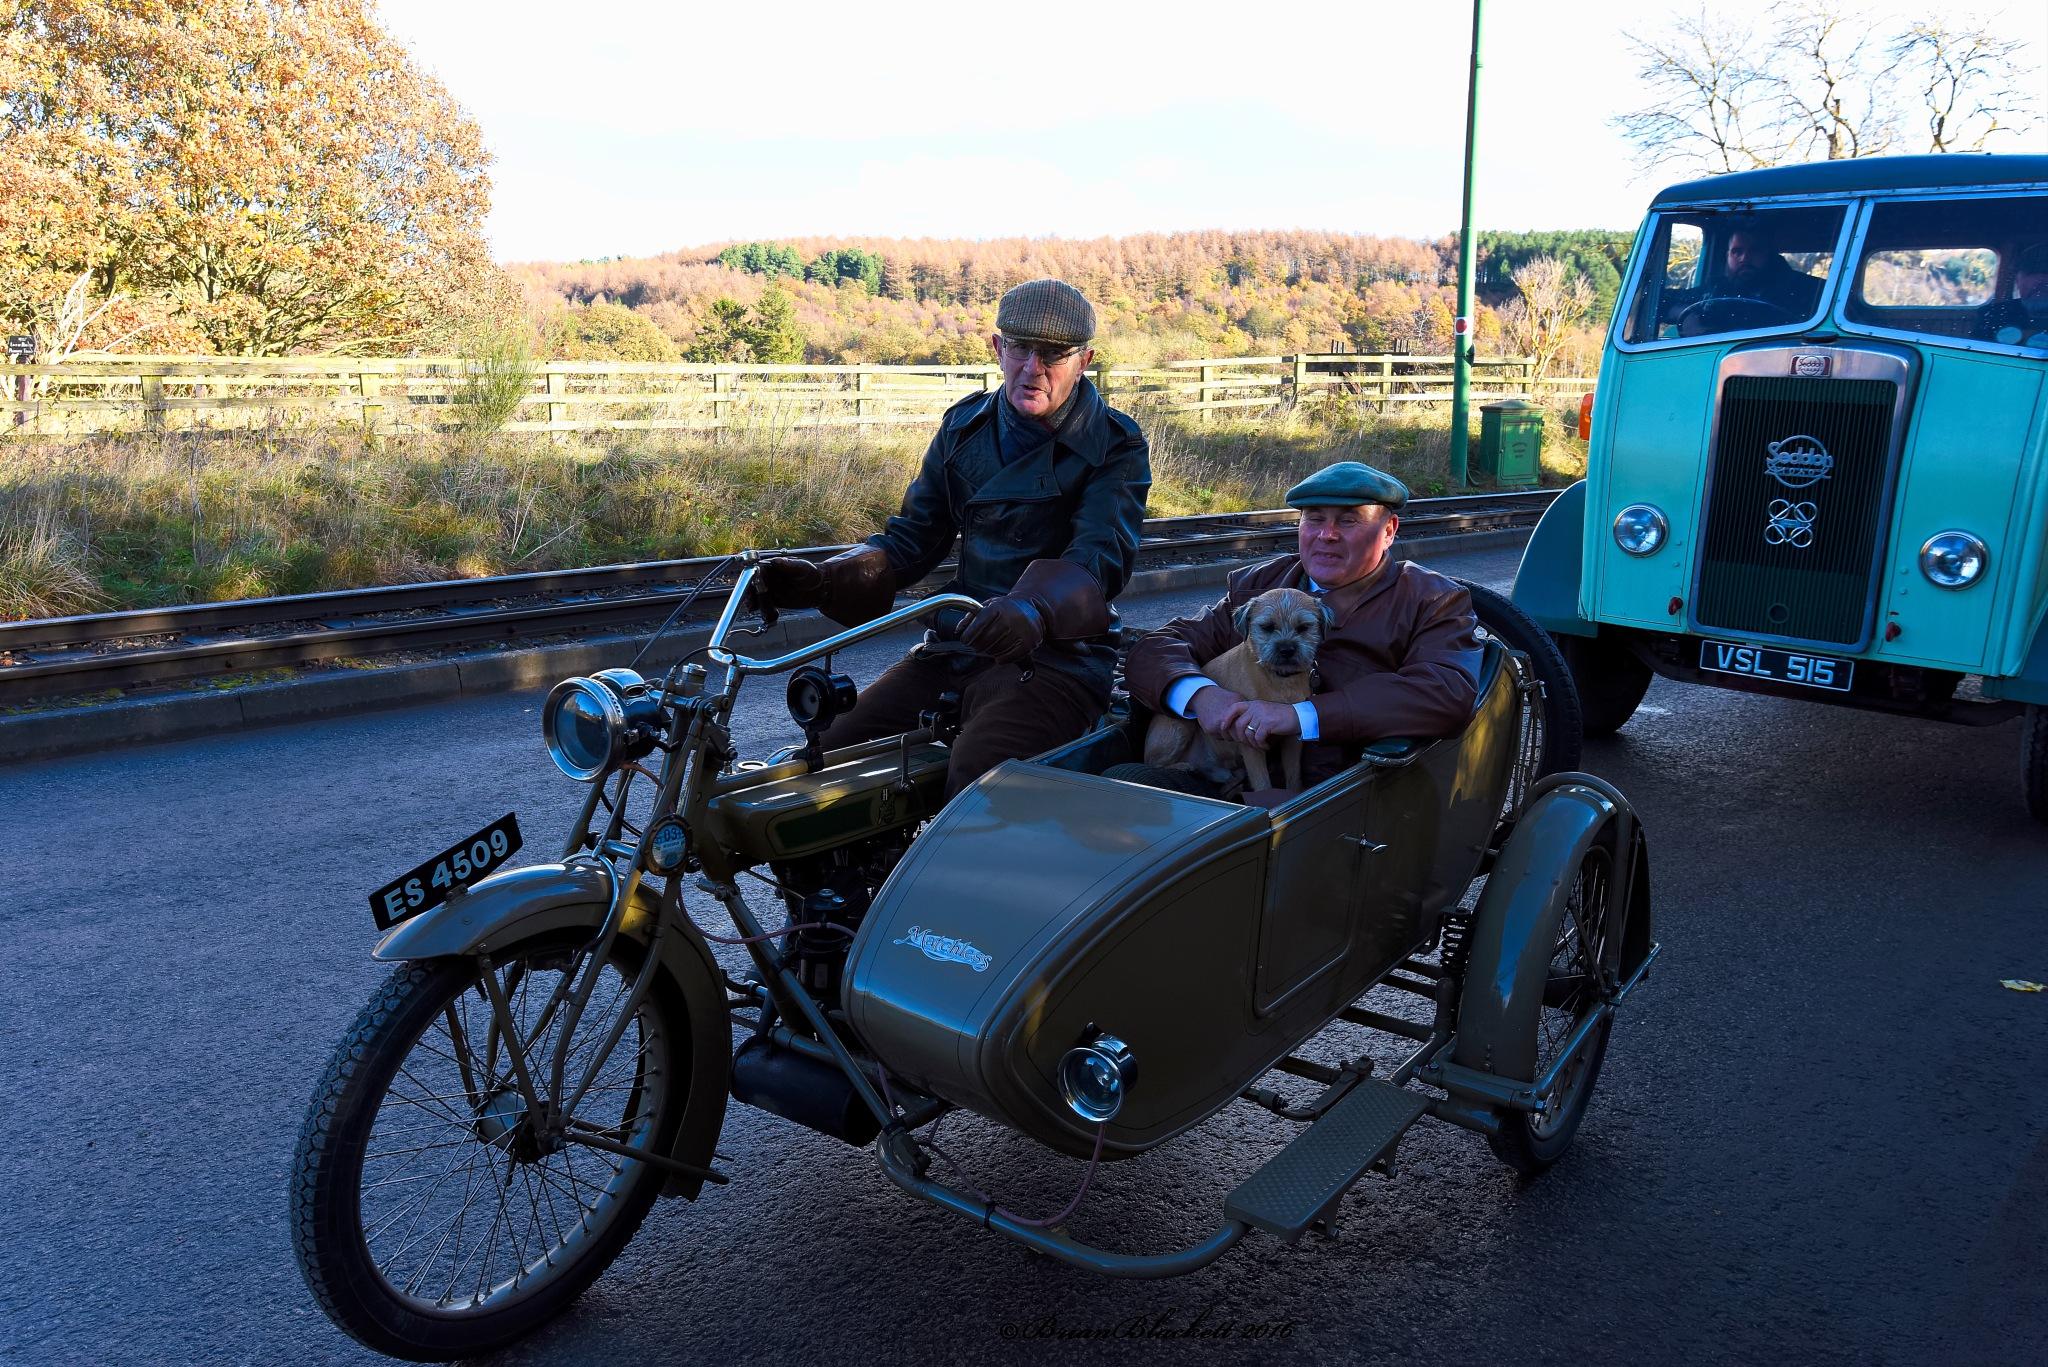 Sidecar From Yesteryear. by brianblackett